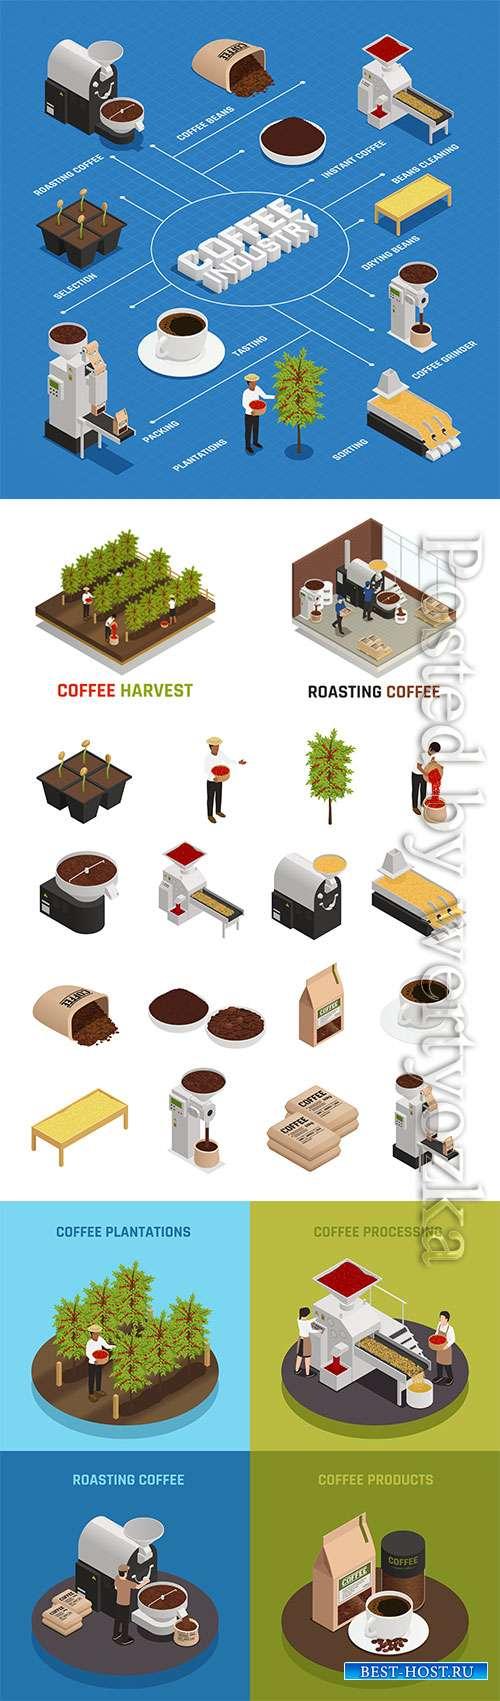 Isometric roasting coffee vector illustration template